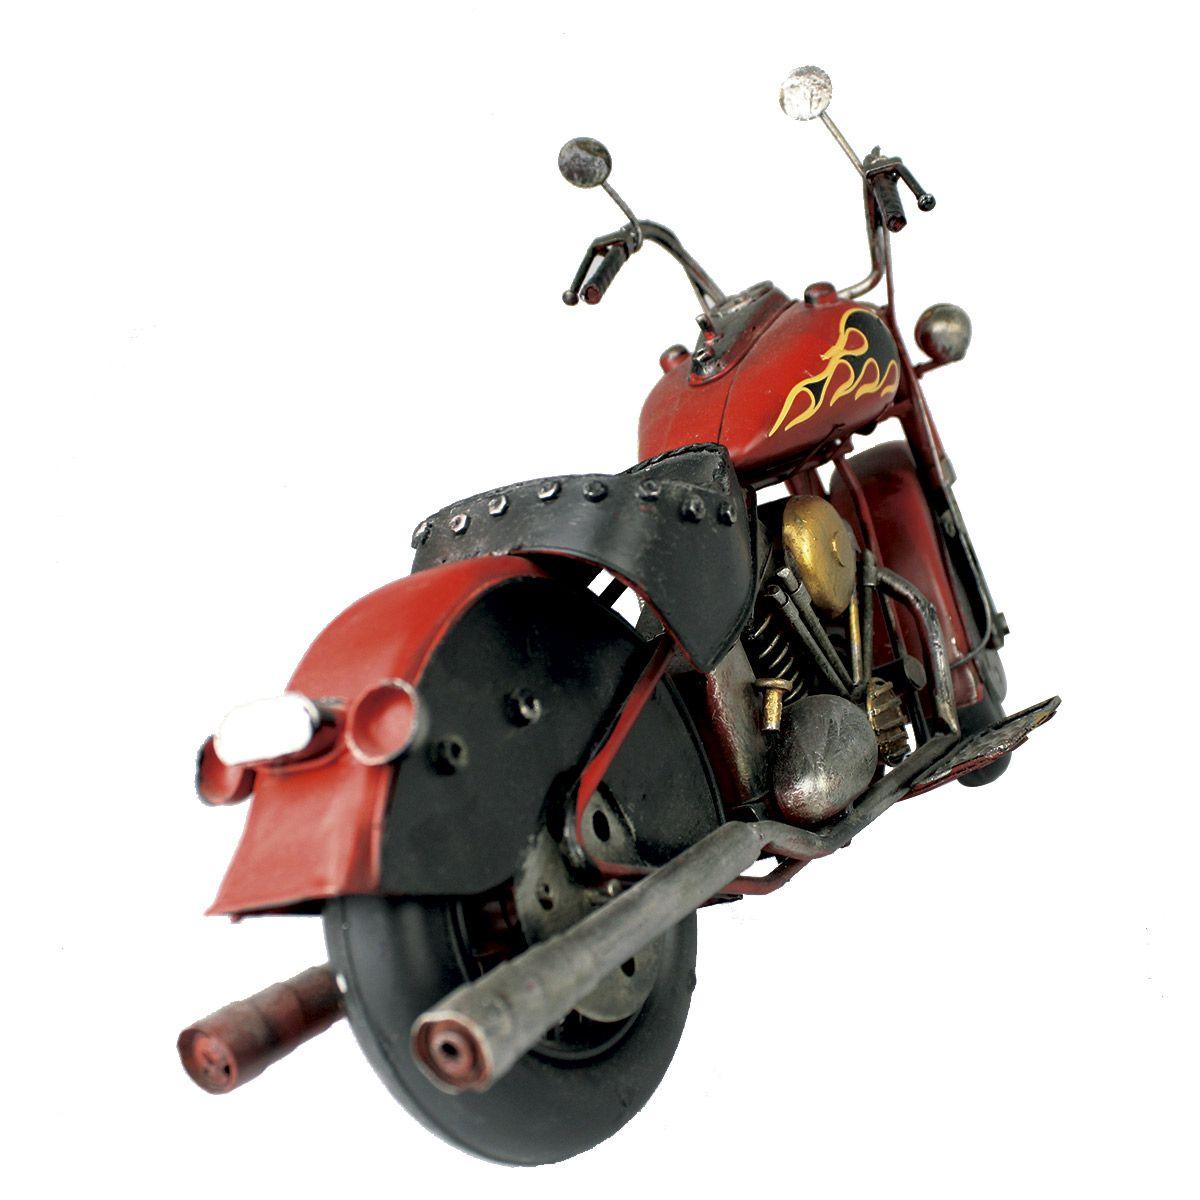 Moto Vintage decorativa de Metal Red Fire 1208